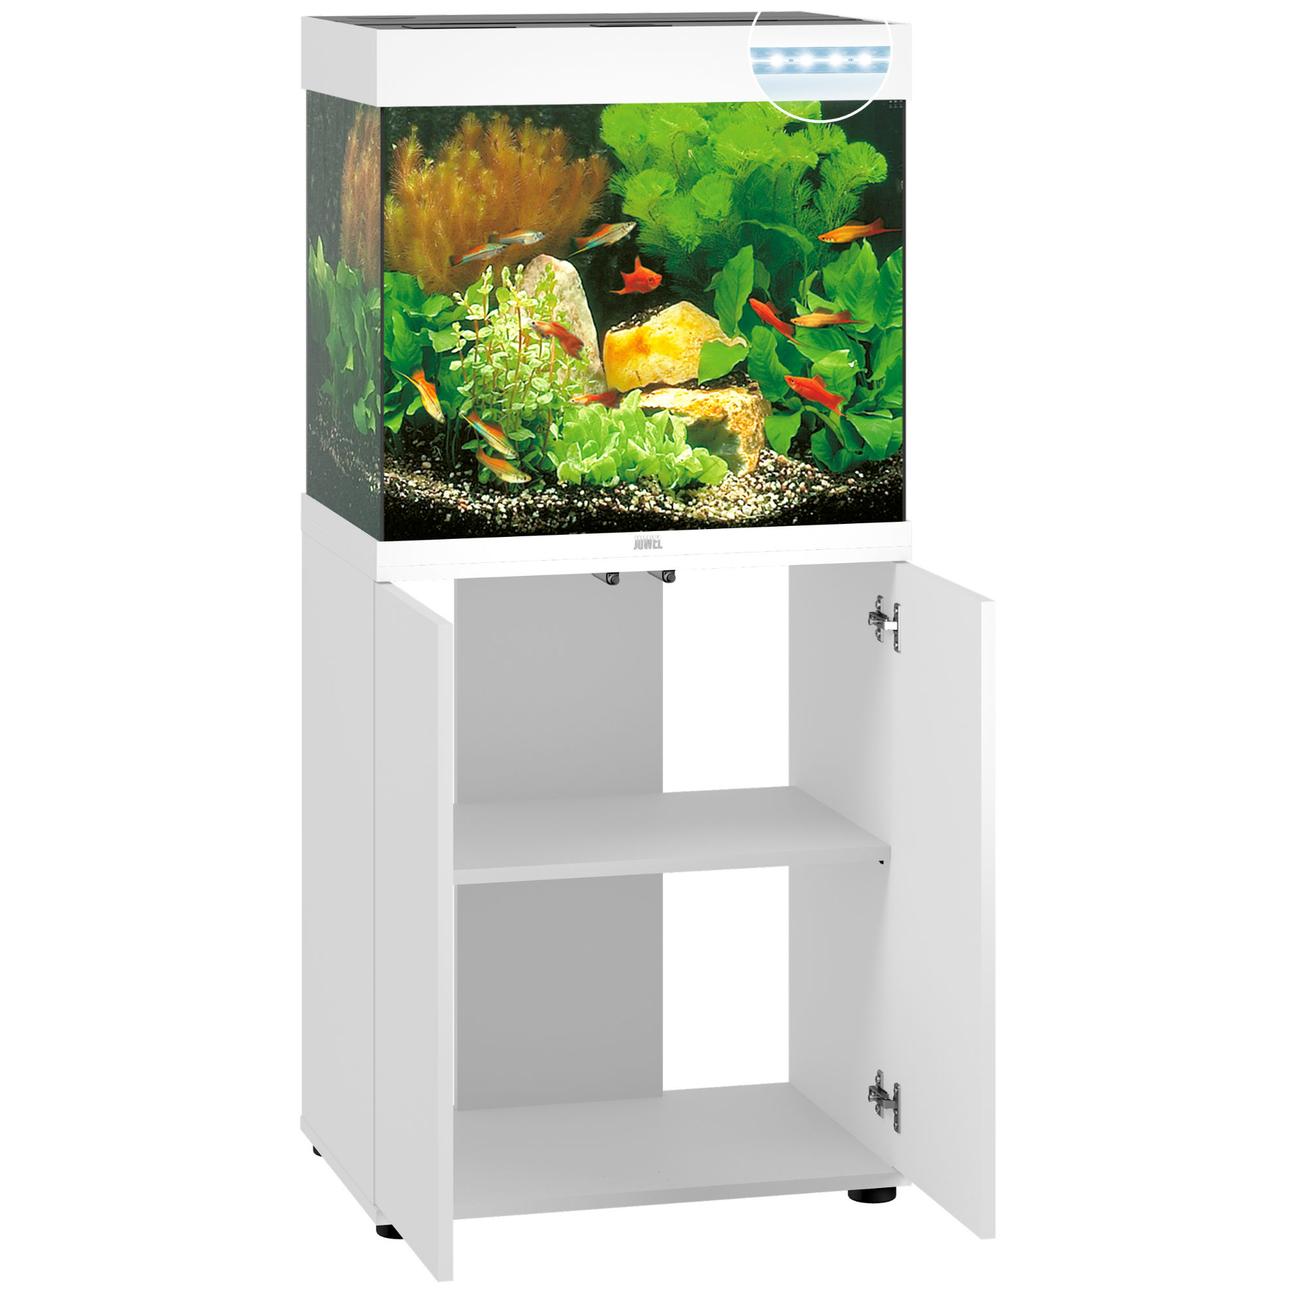 Juwel Lido 120 LED Aquarium mit Unterschrank, Bild 3